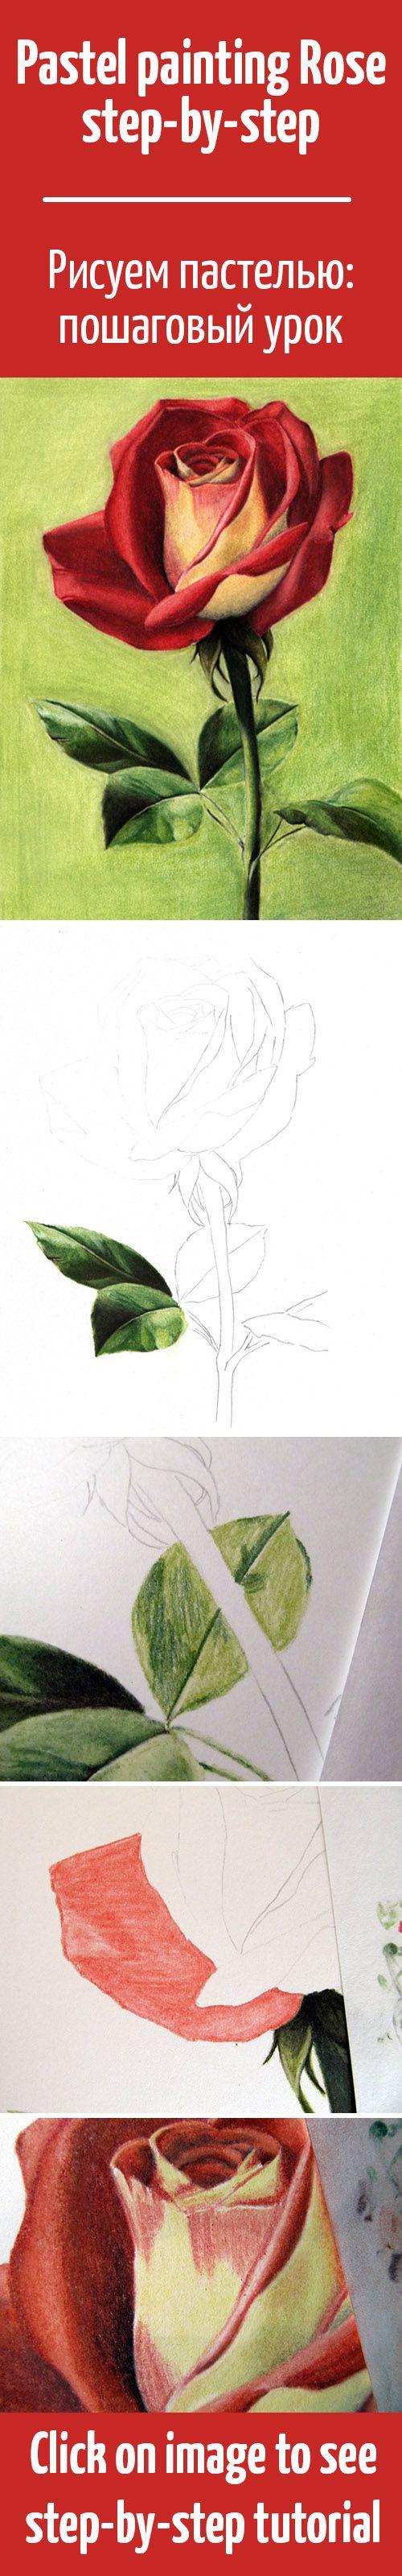 Рисуем розу пастельными карандашами — пошаговый урок / Pastel paintihg rose step-by-step #tutorial #easy #drawing